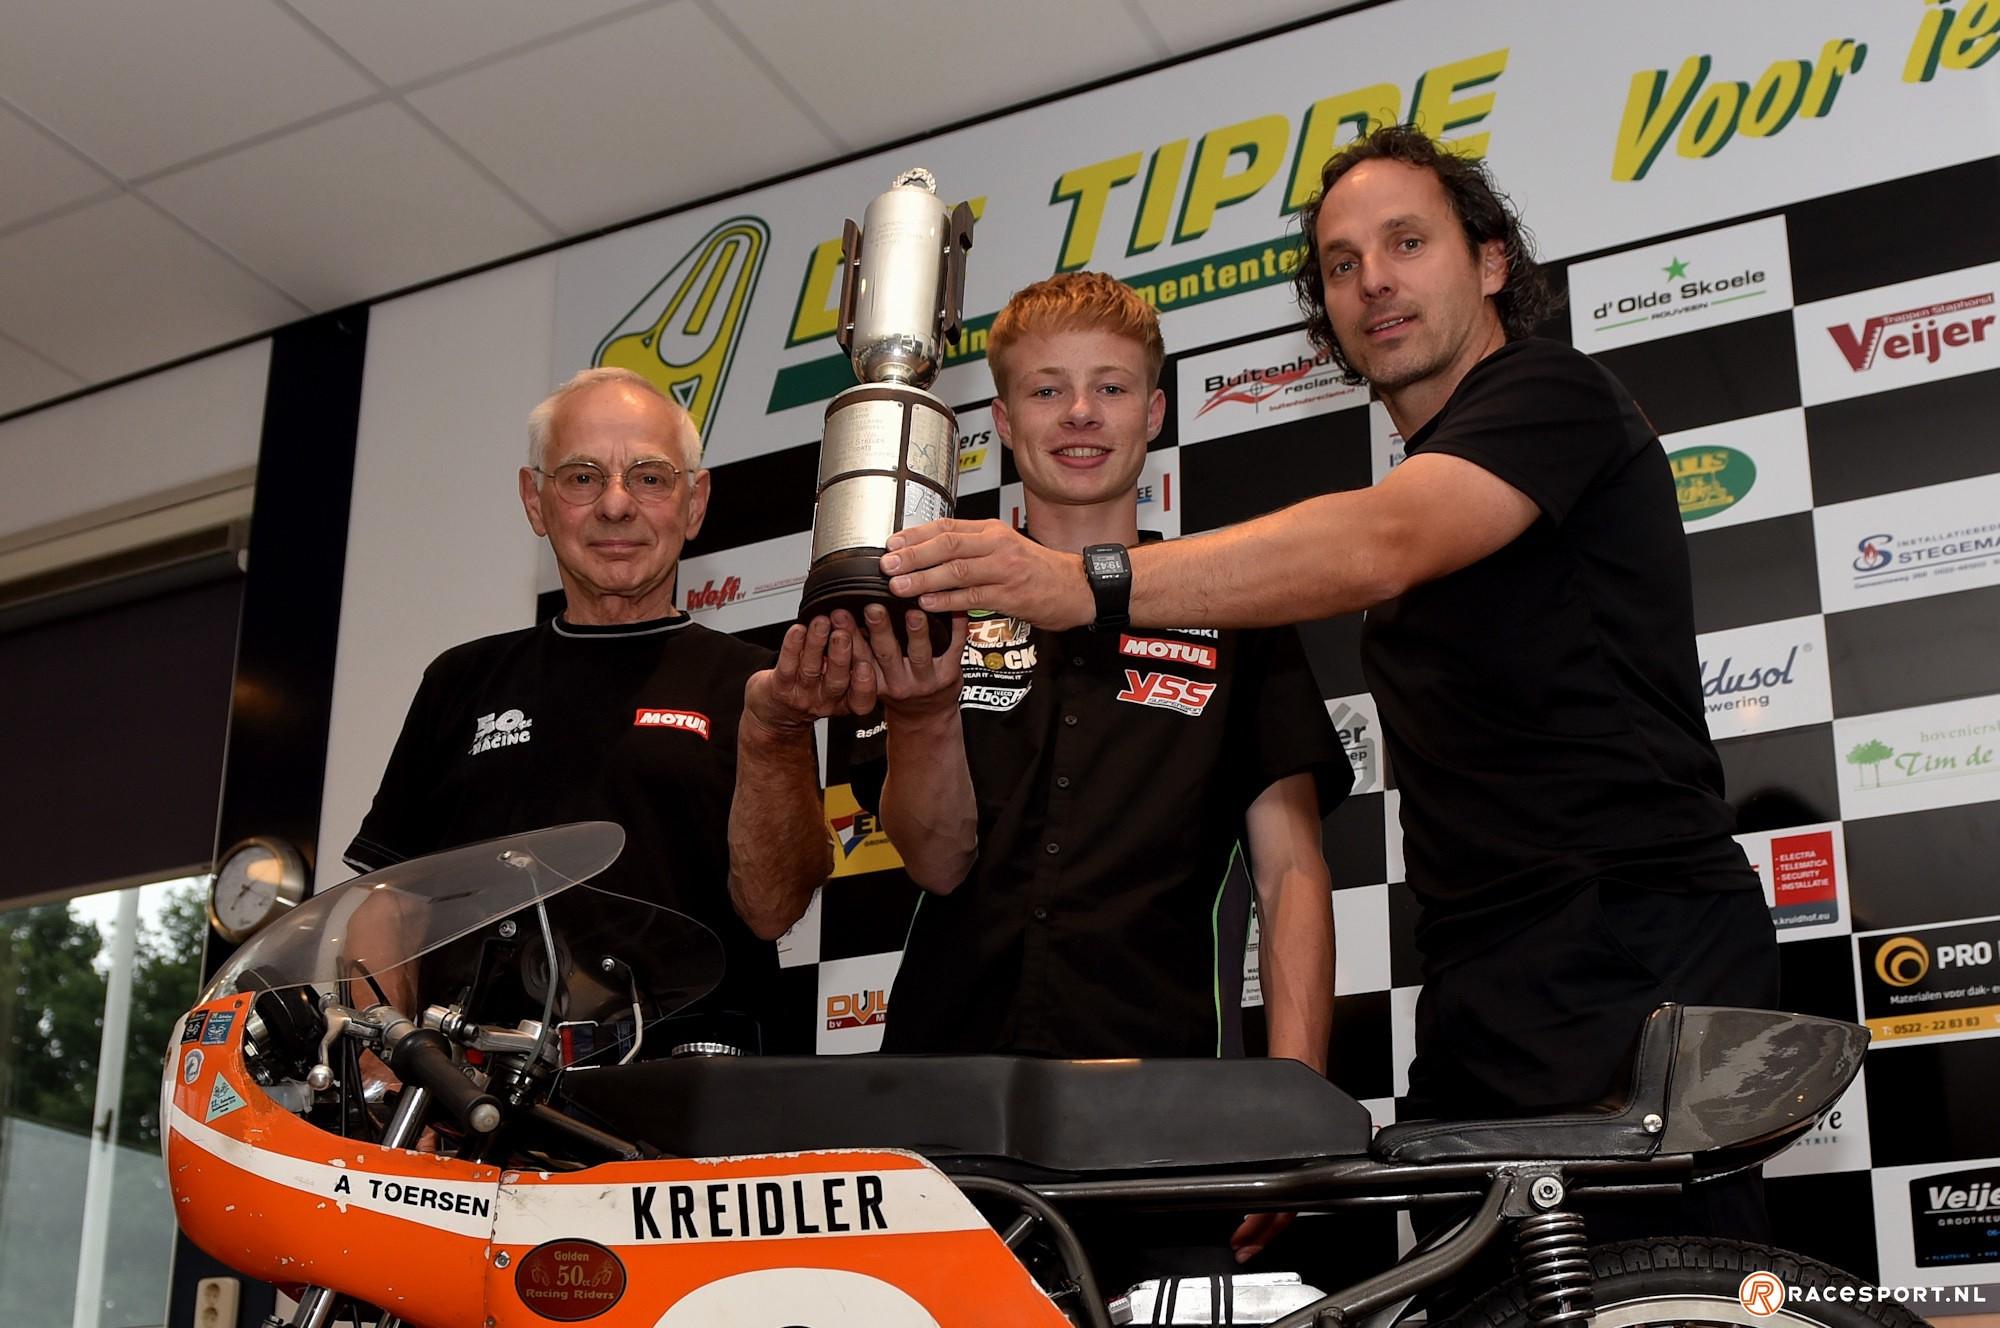 V.l.n.r. Aalt Toersen, Jeffrey Buis en Barry Veneman